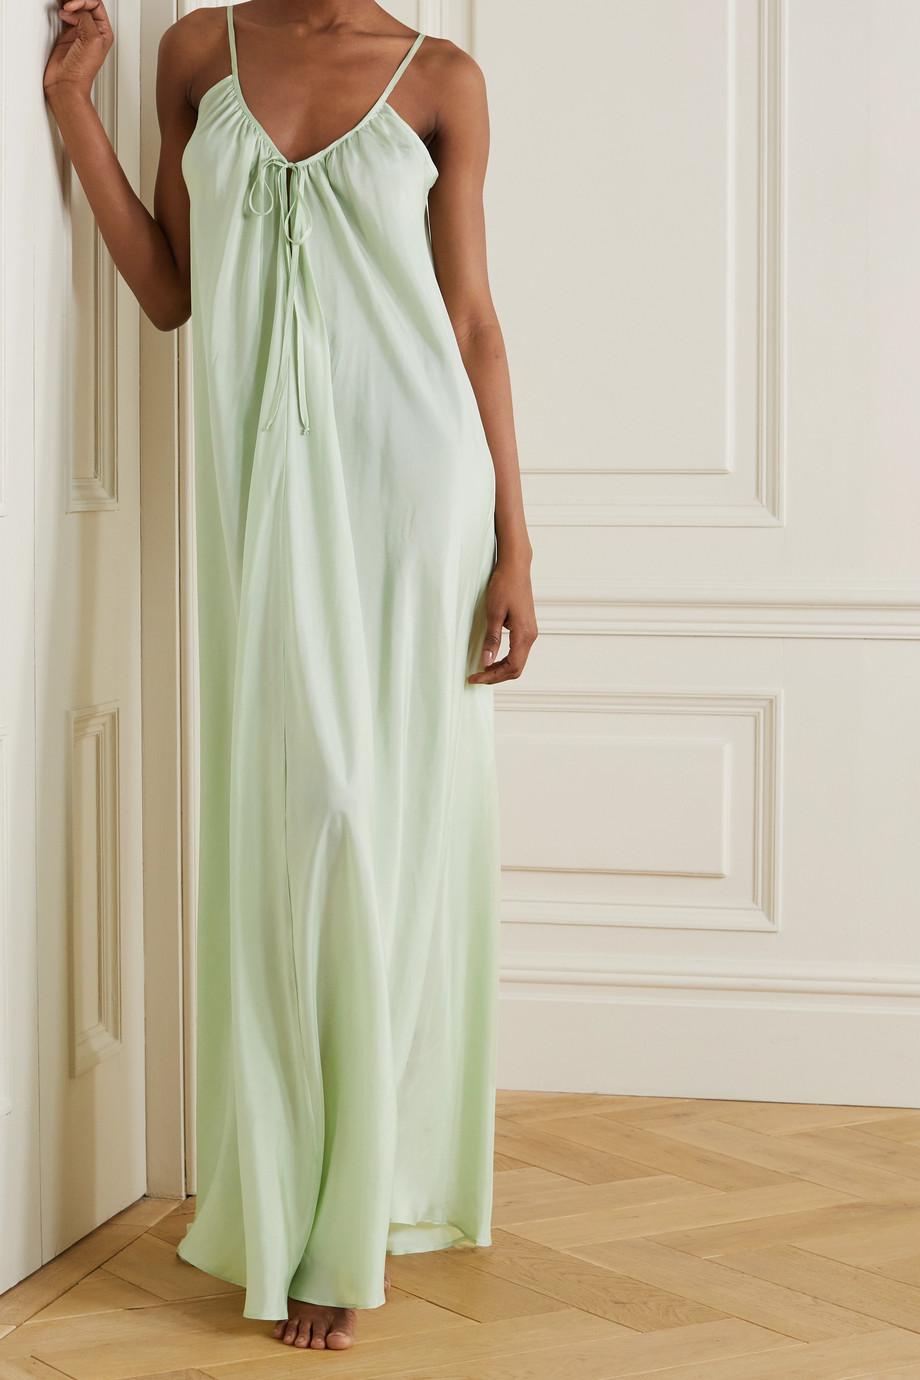 Pour Les Femmes Silk-habotai nightdress